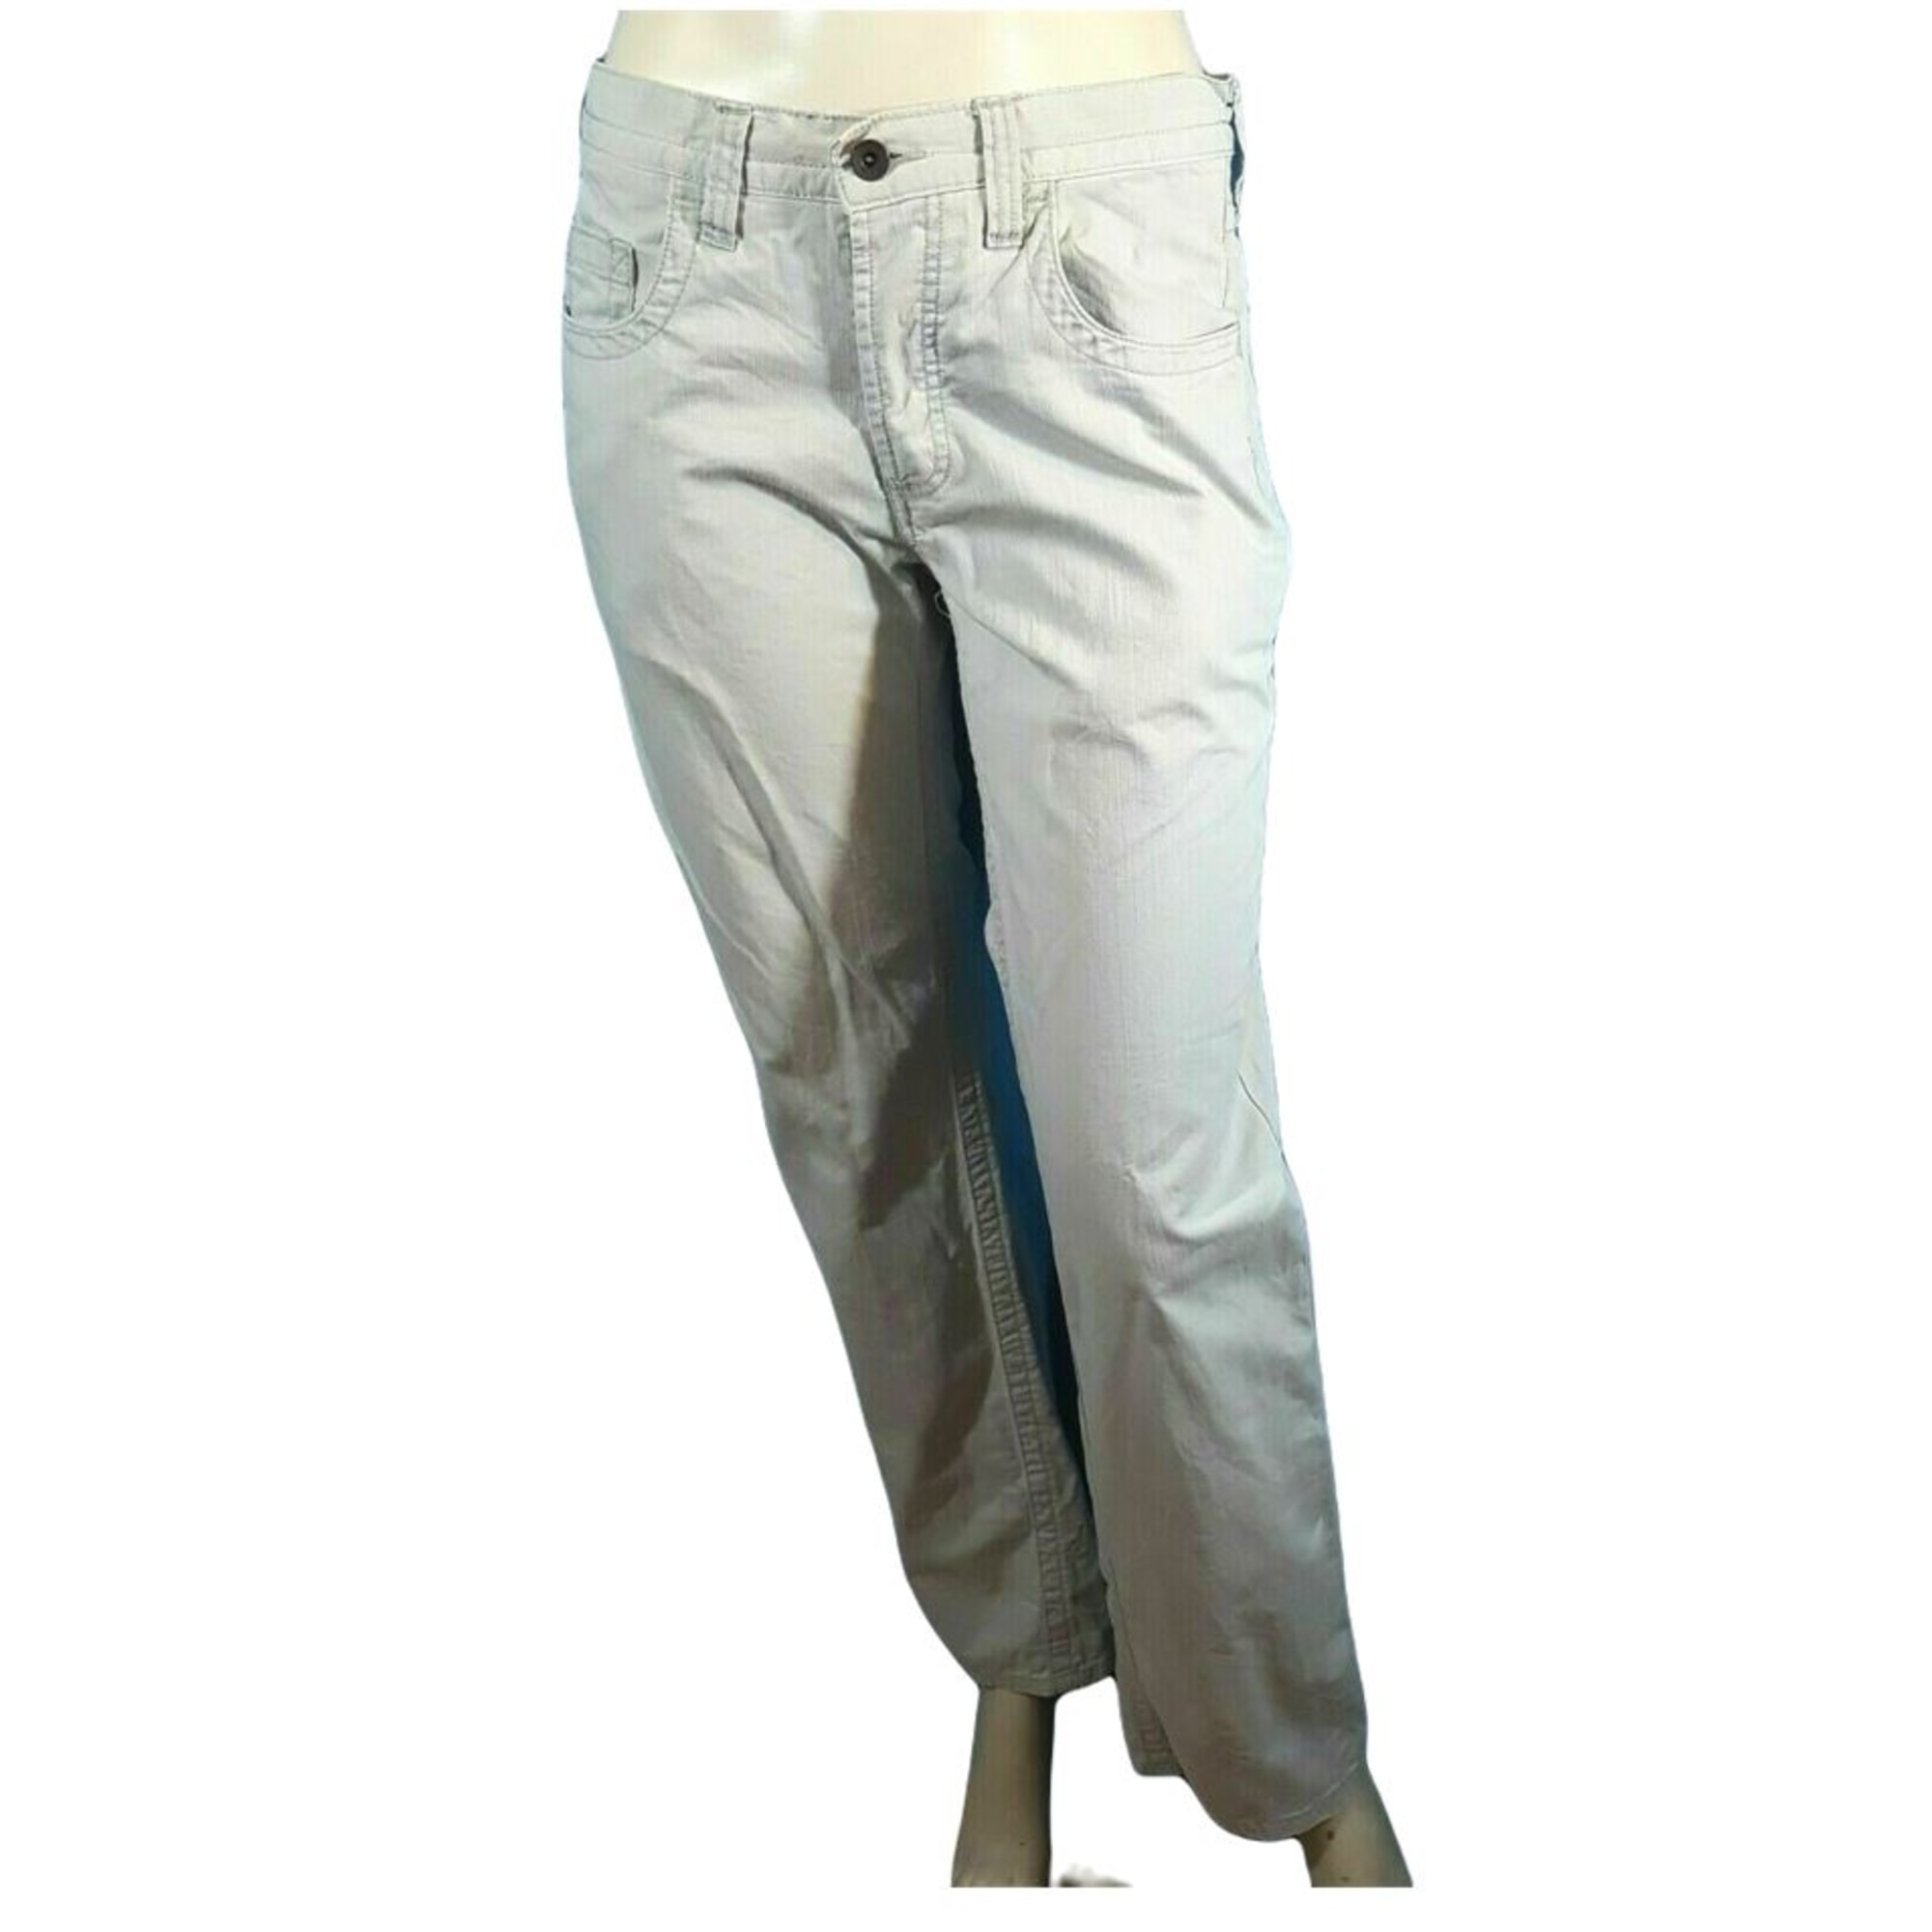 Straight Leg Jeans JULES Gray, charcoal